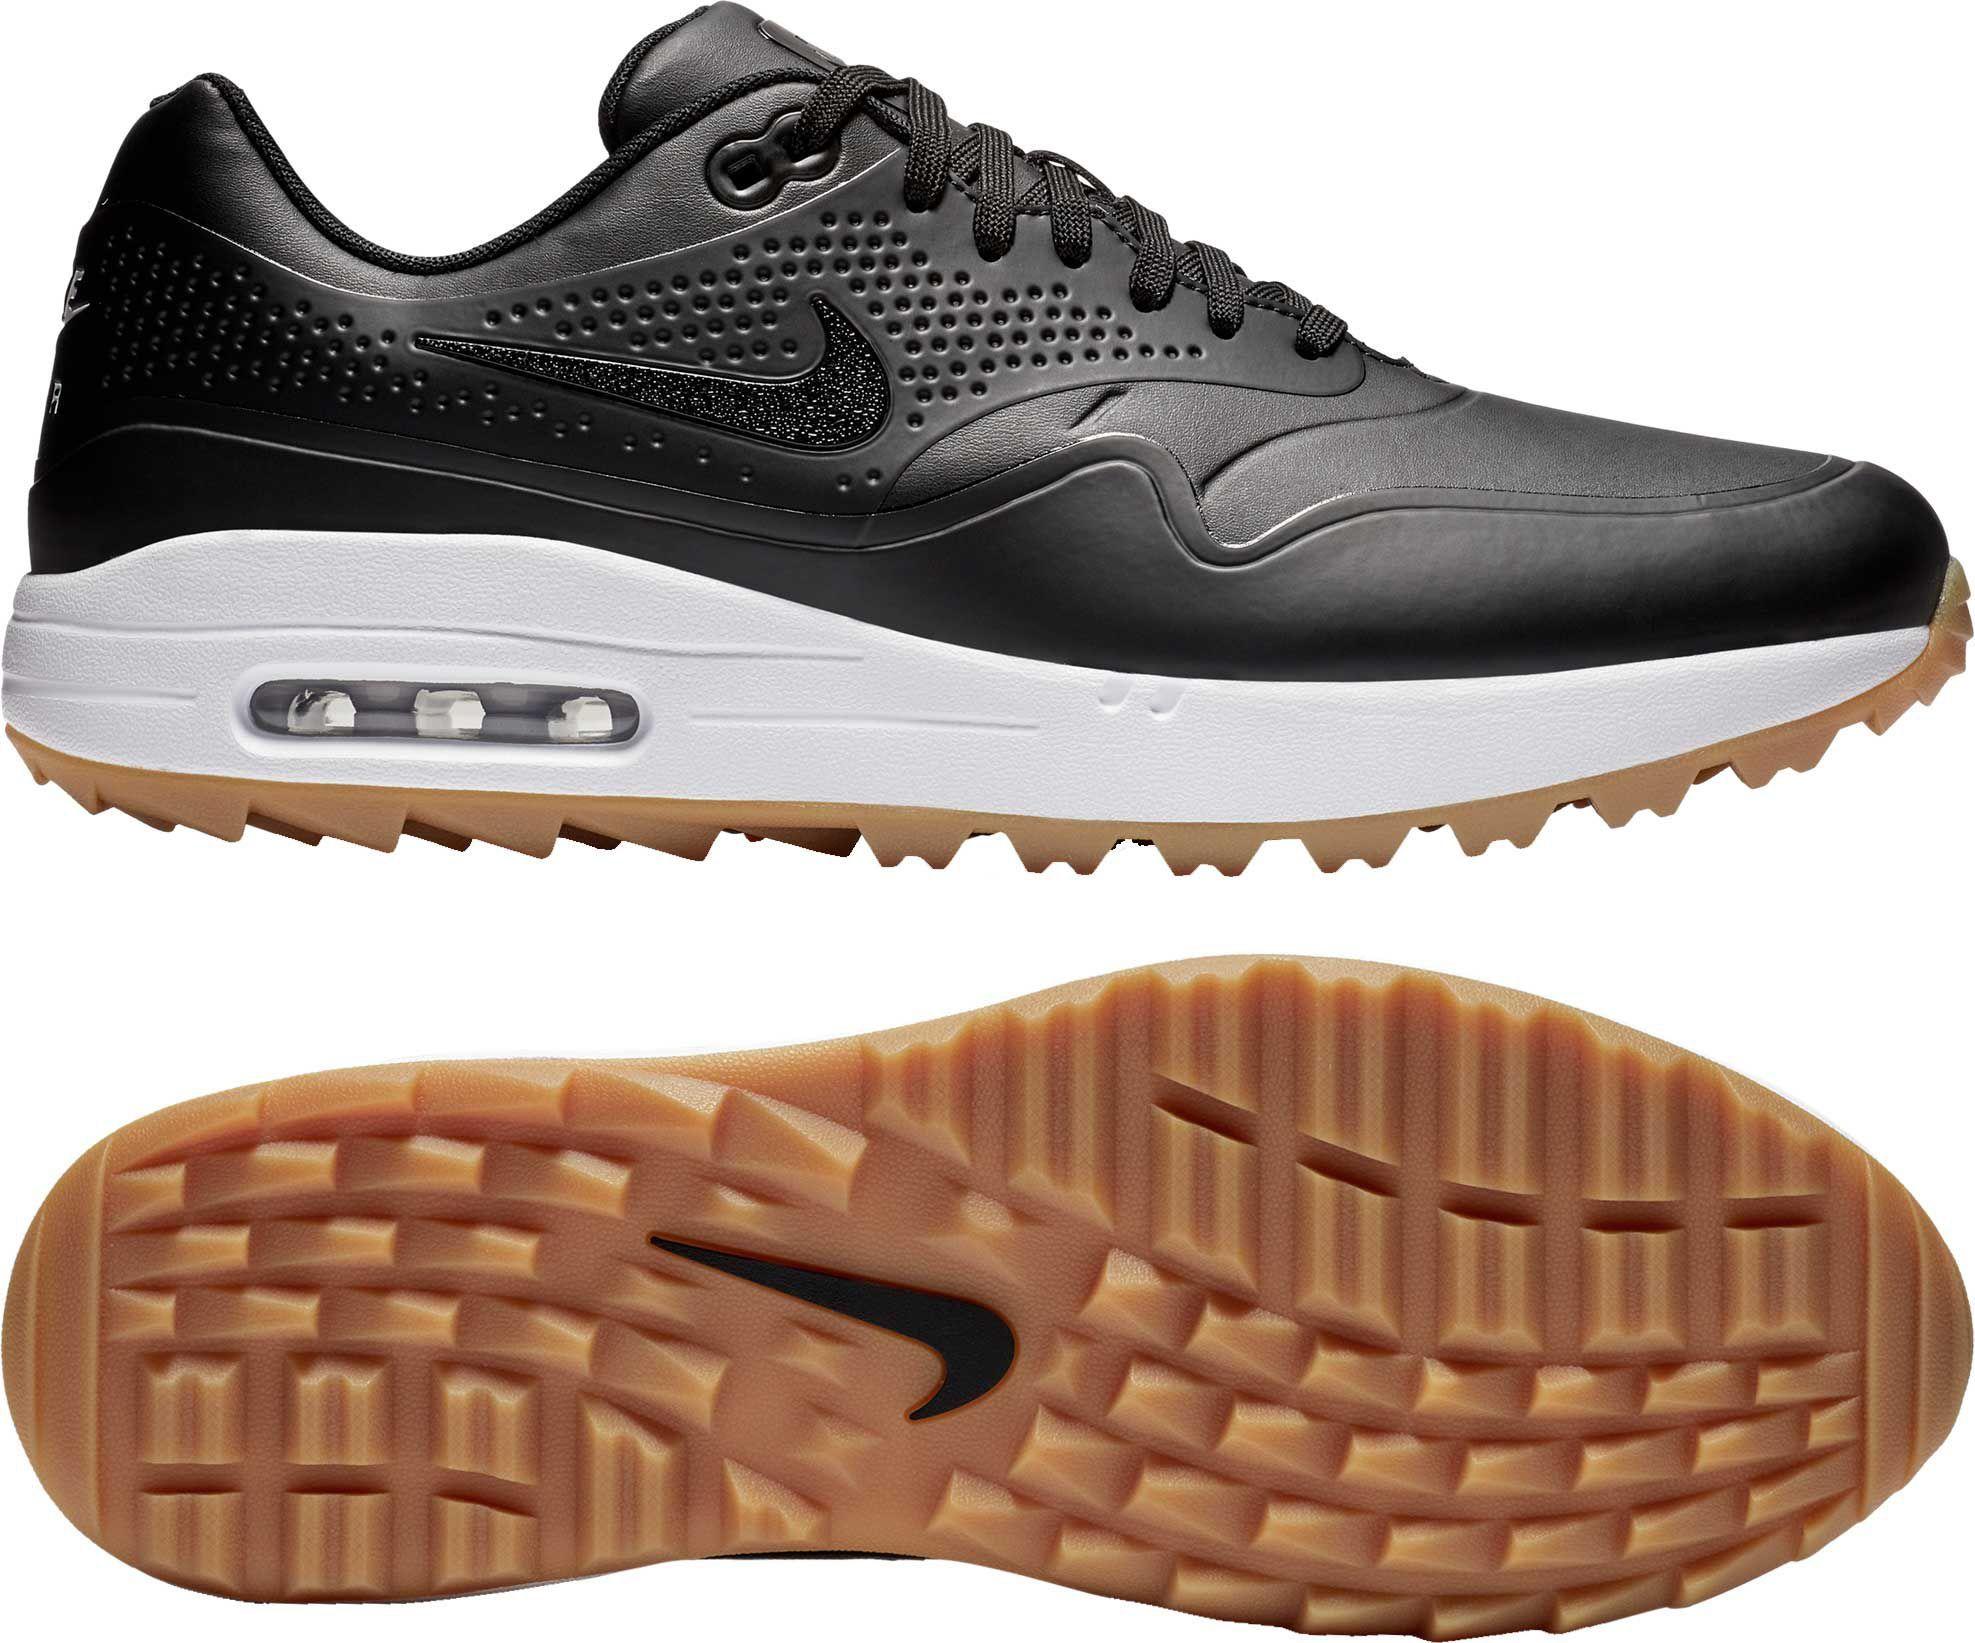 Nike Men's Air Max 1 G Golf Shoes, Size: 7.5, White   Womens